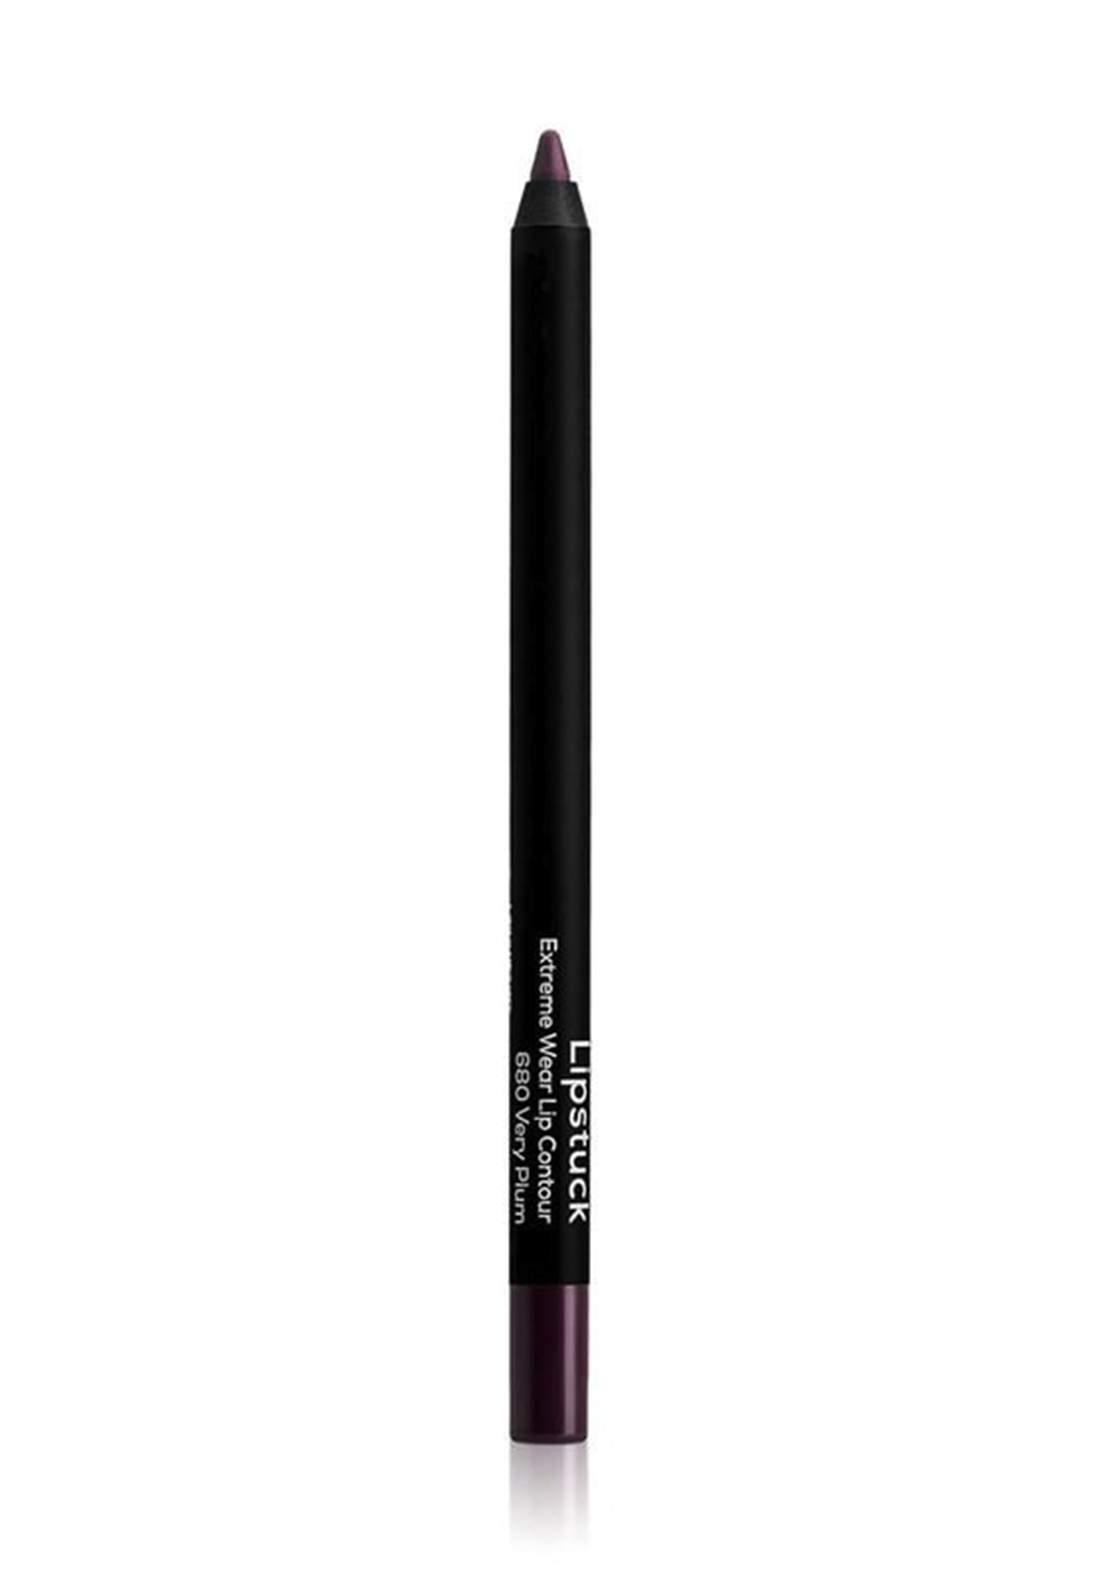 Wow By Wojooh W680 Lipstuck Extreme Wear Lip Contour No.680 Very Plum 1.20g محدد الشفاه